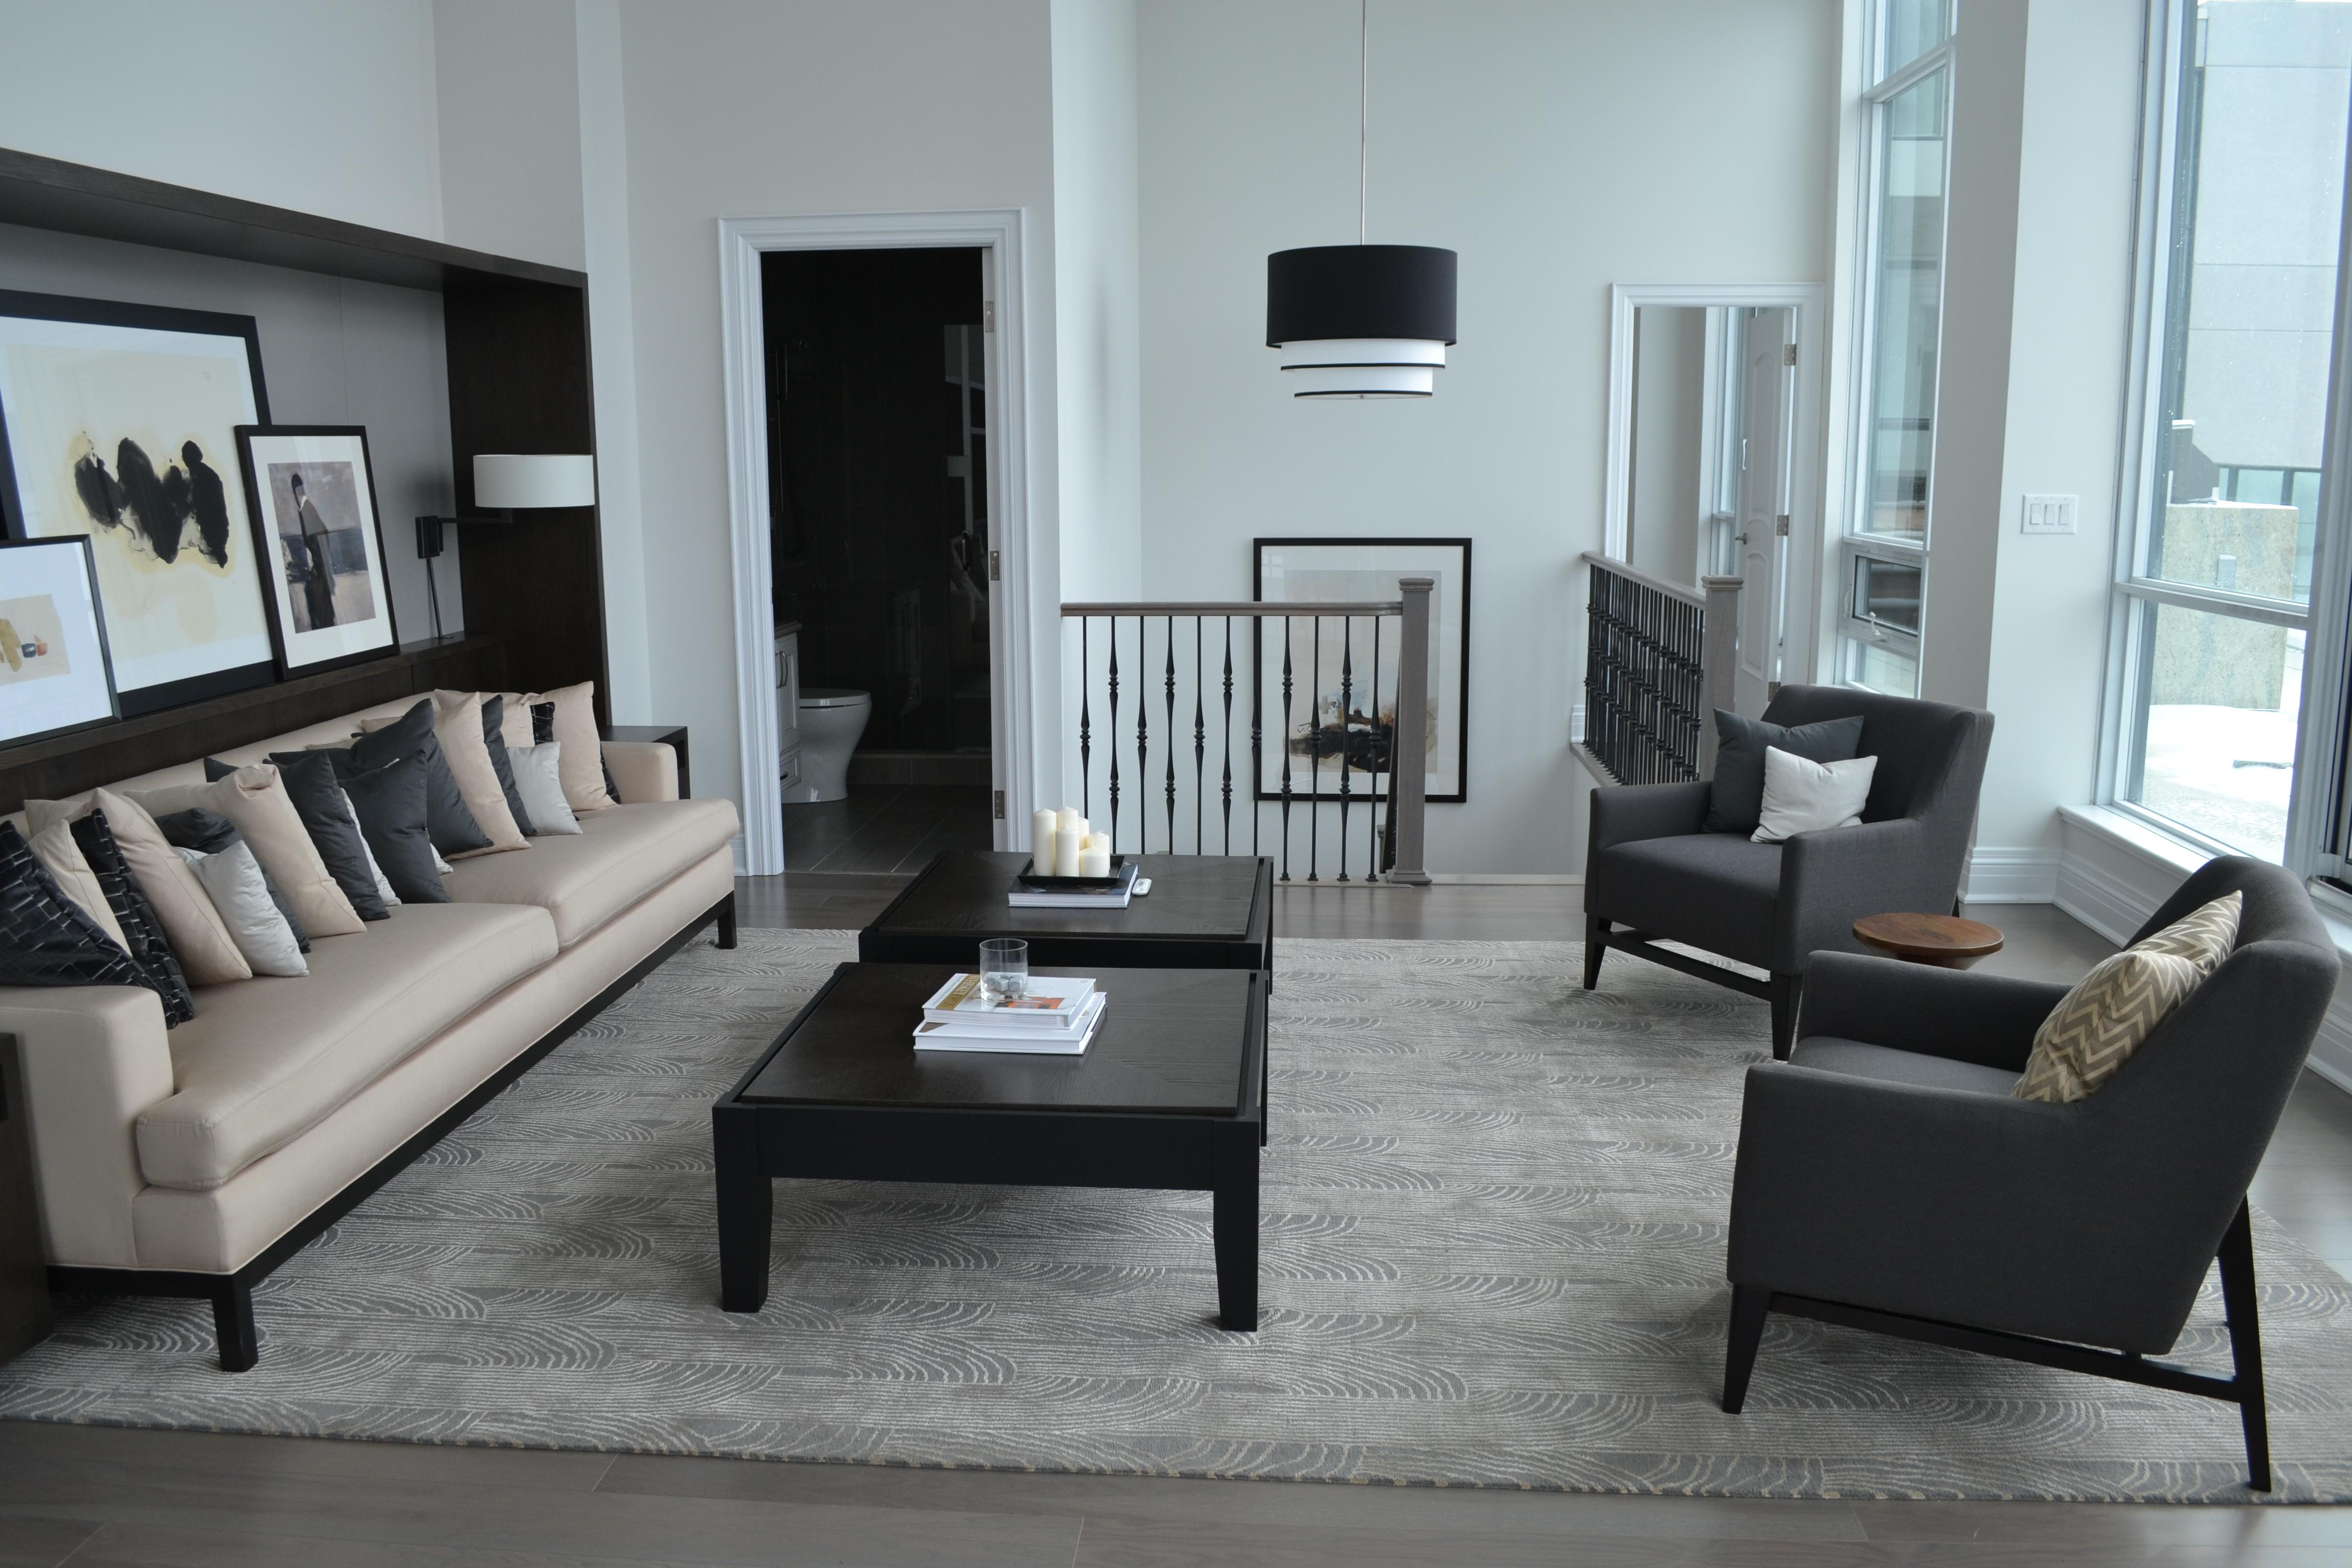 Home Design App How To Make A Second Floor 33 Bay 8 Buzzbuzzhome News